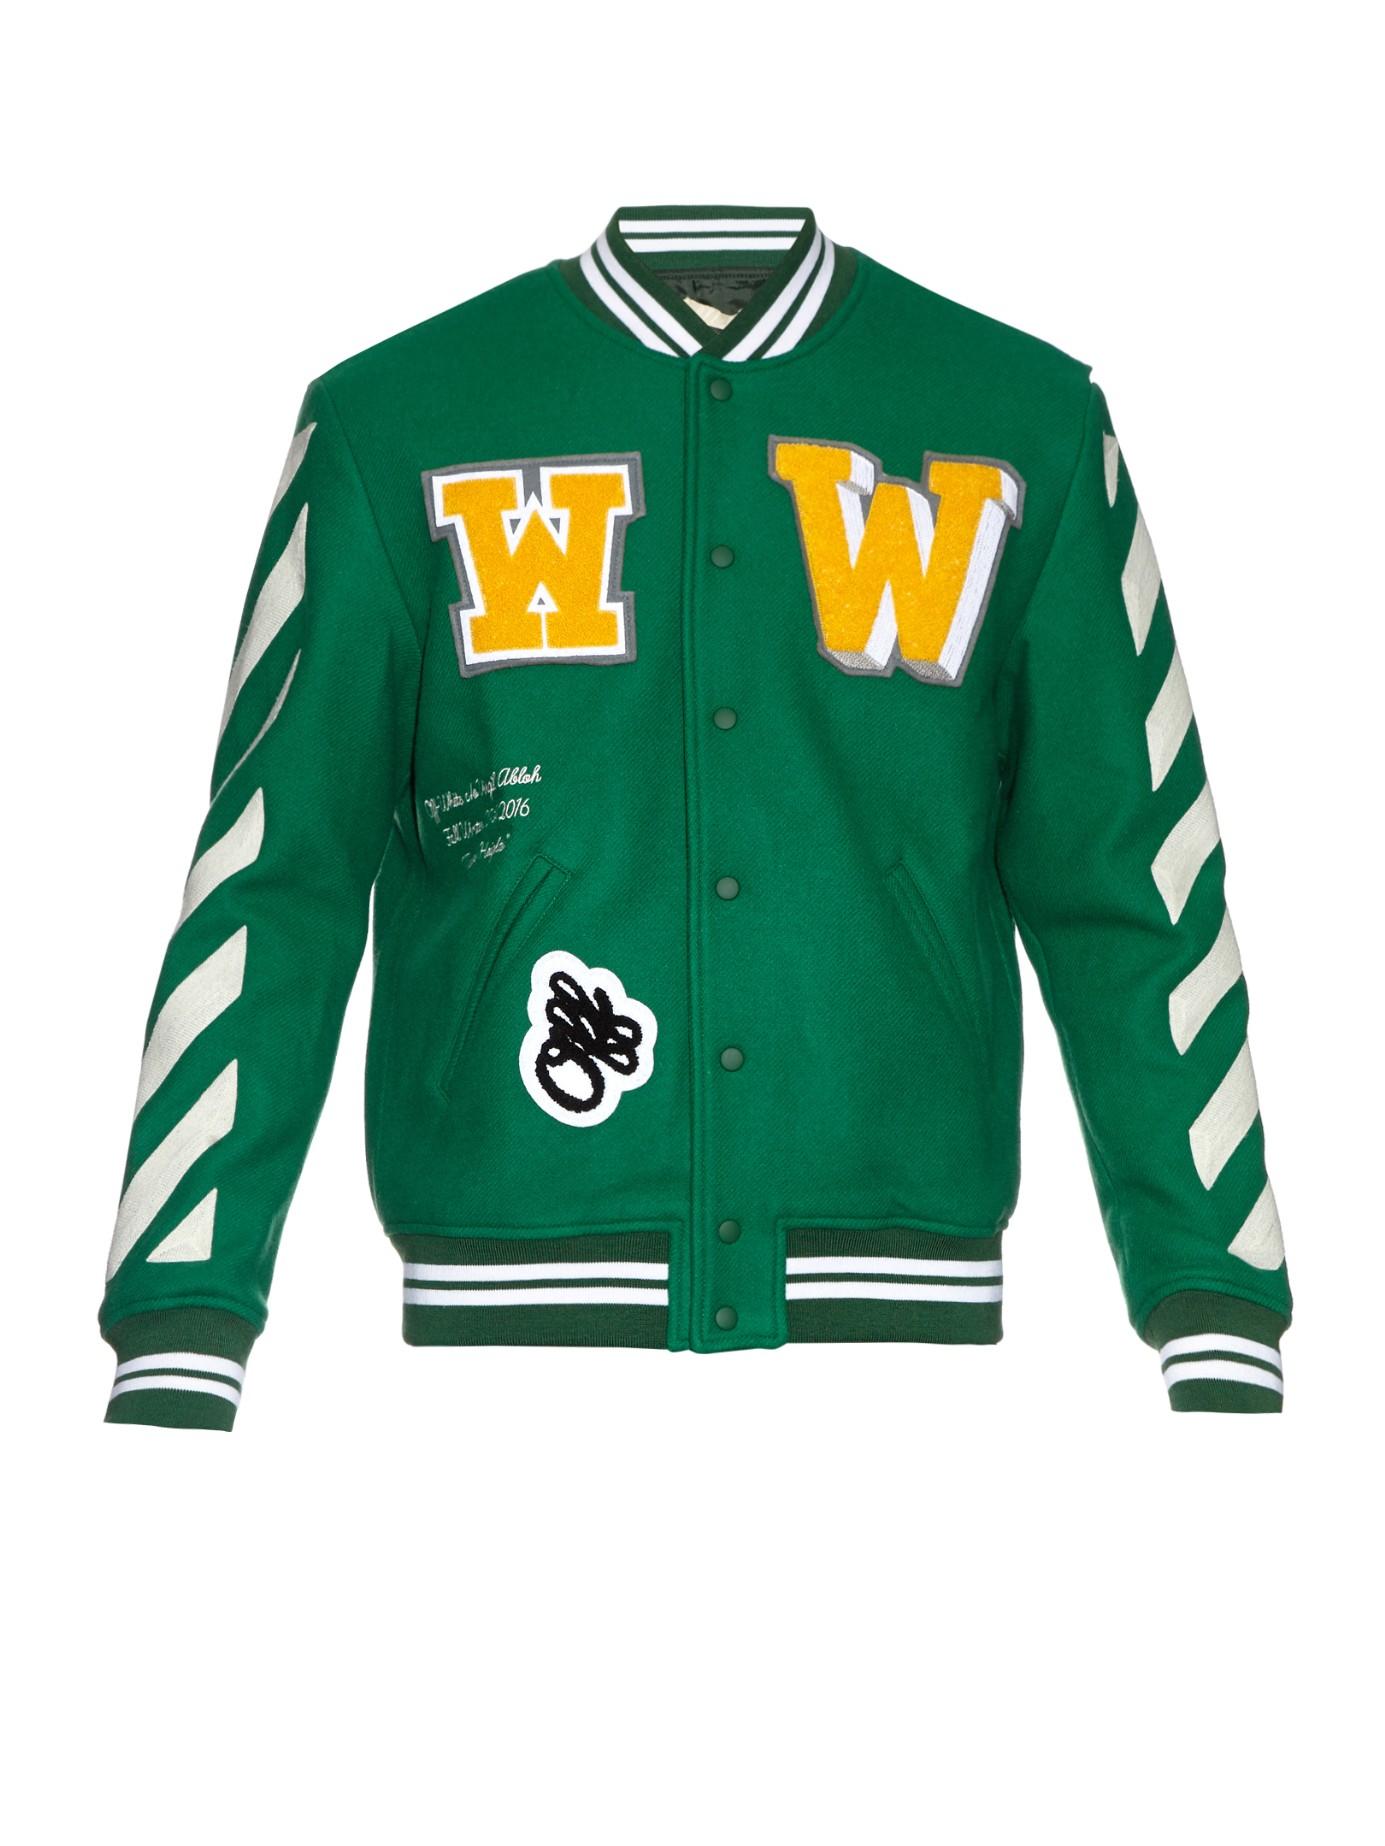 7dcef5a25faa Lyst - Off-White c o Virgil Abloh Letterman Wool-blend Varsity ...